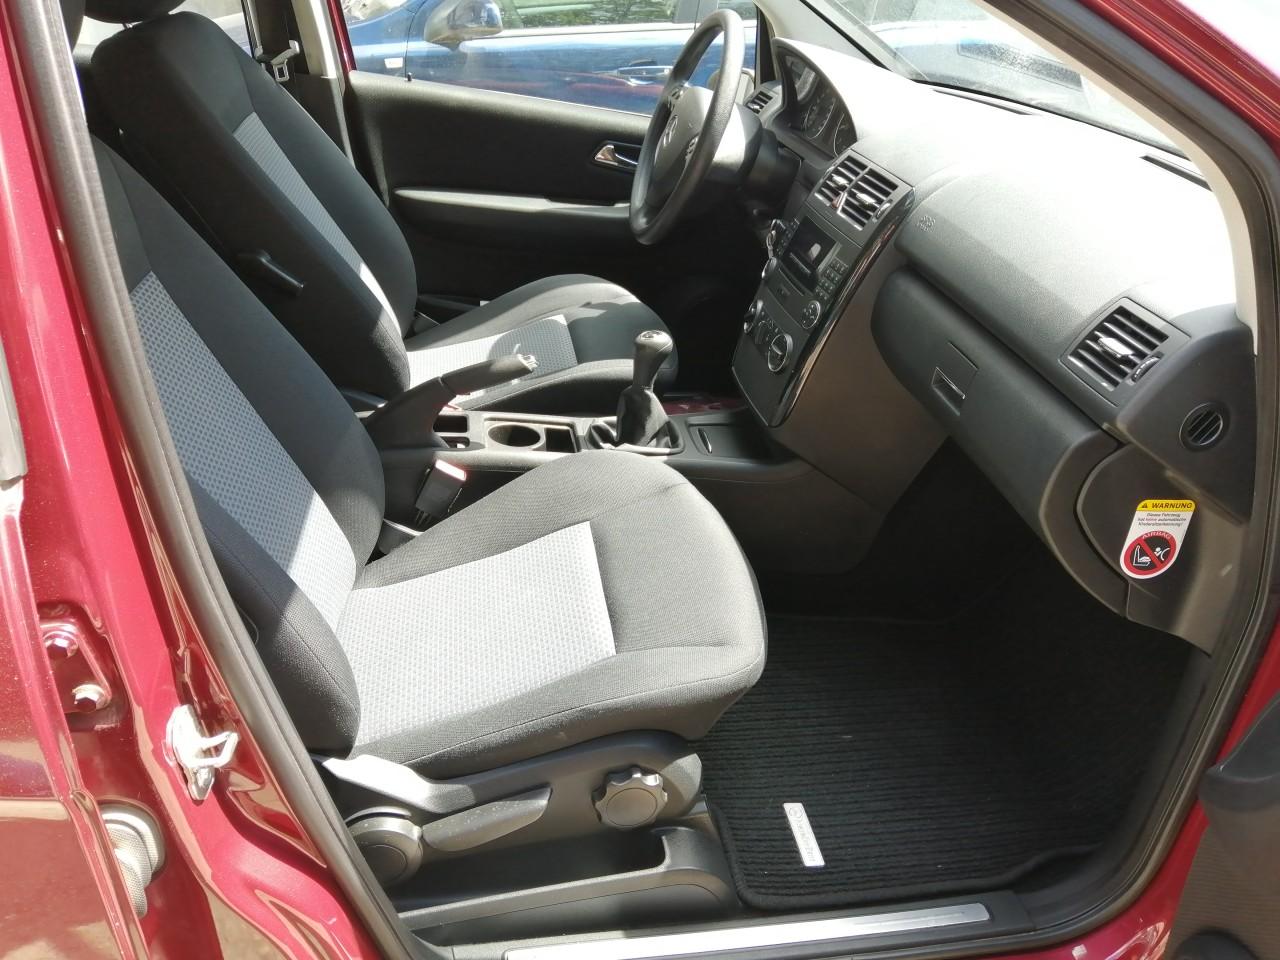 Mercedes A 150 1.5 2007